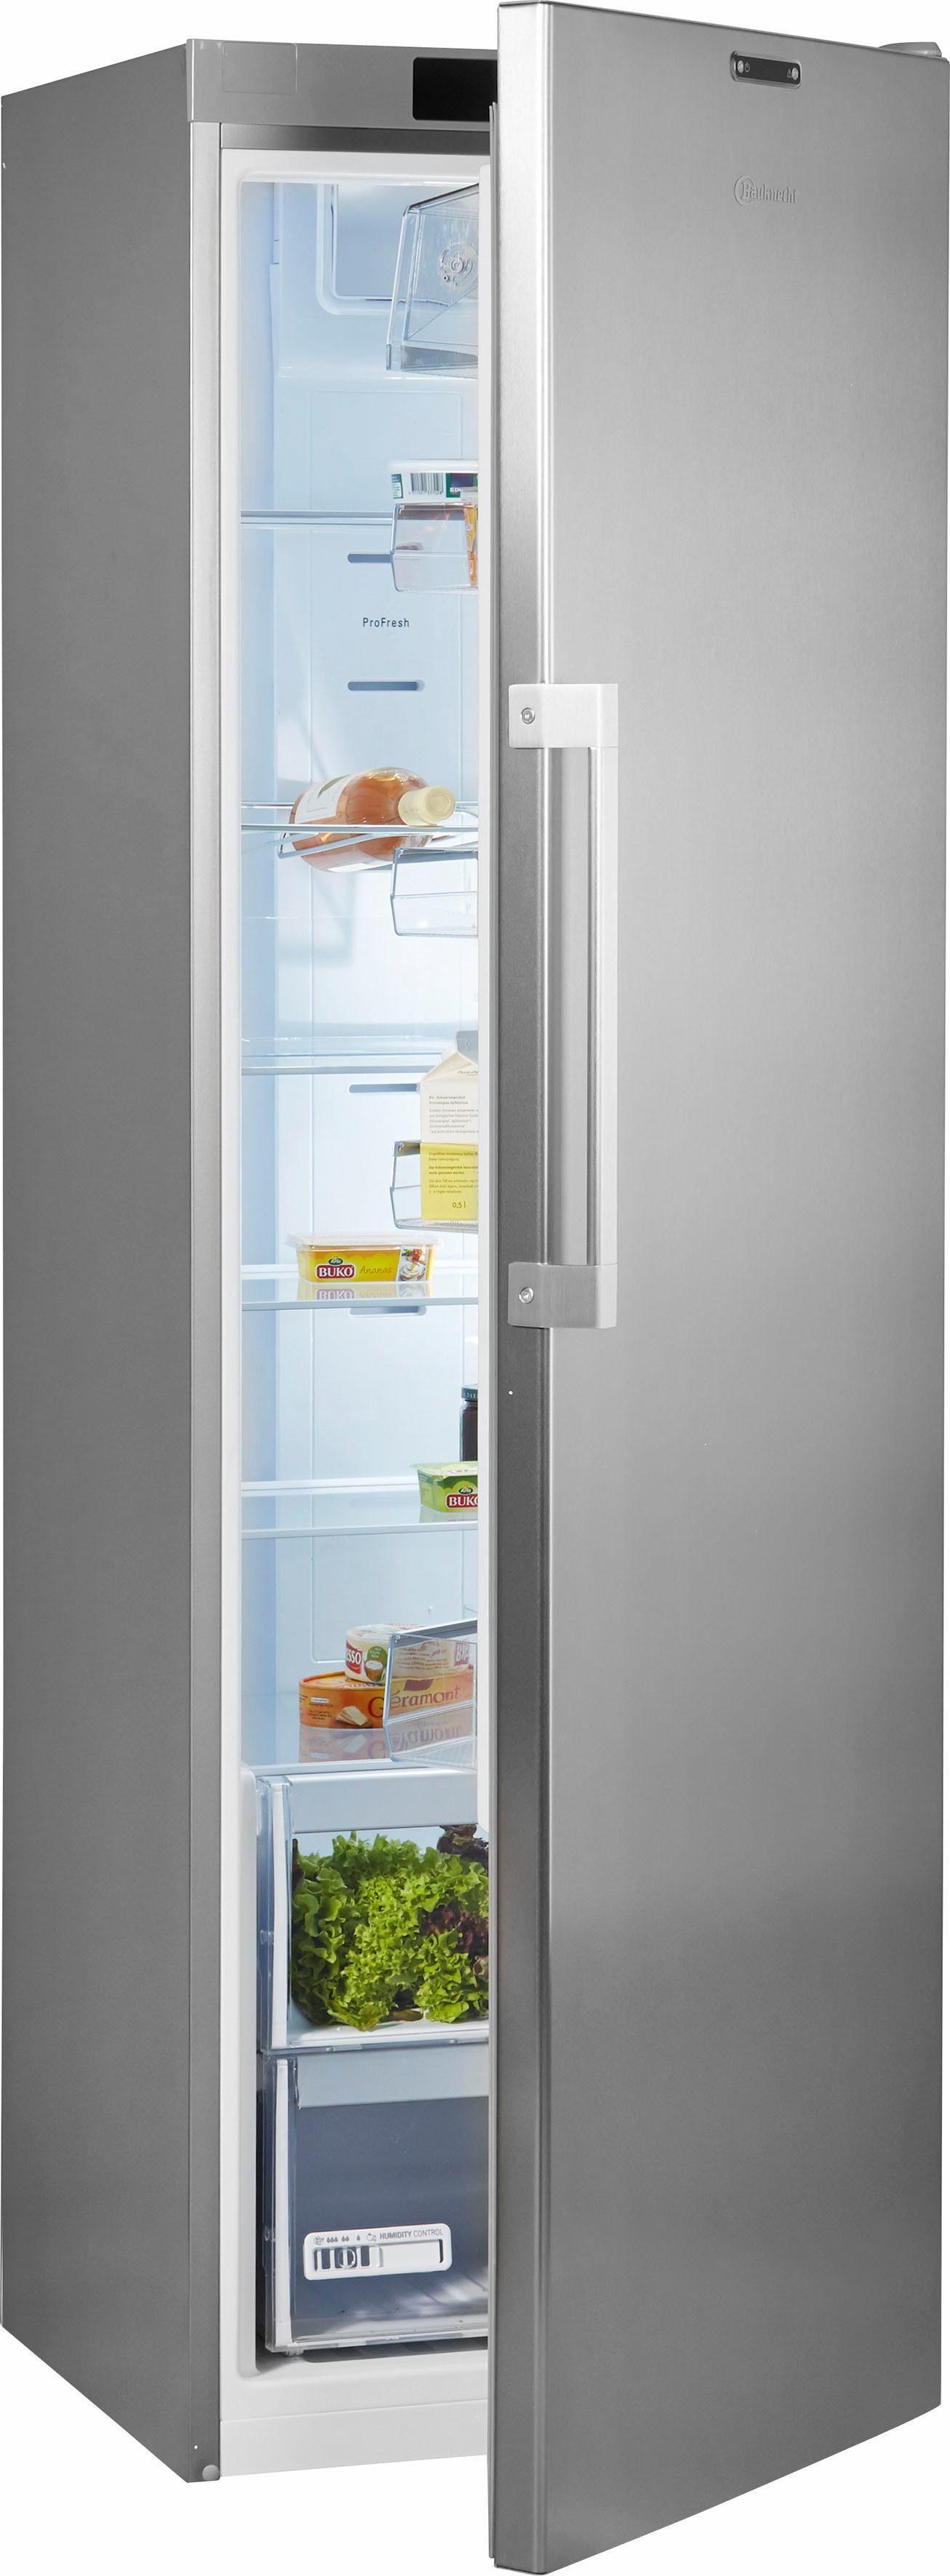 Bauknecht Kühlschrank KR 19G4 A2+ IN, Energieklasse A++, 187,5 cm hoch, ProFresh